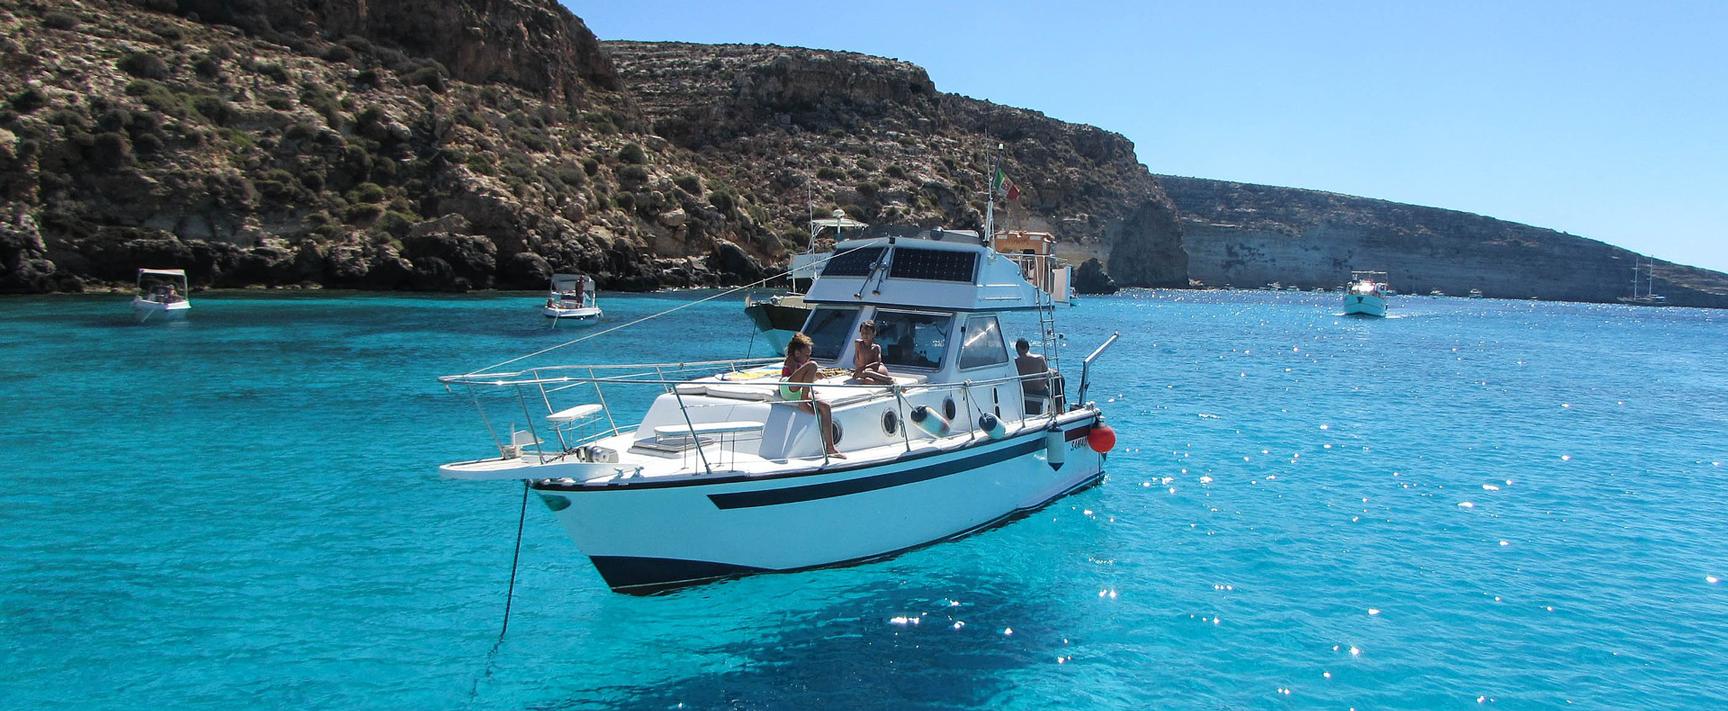 Vakantie in Italië: Lampedusa